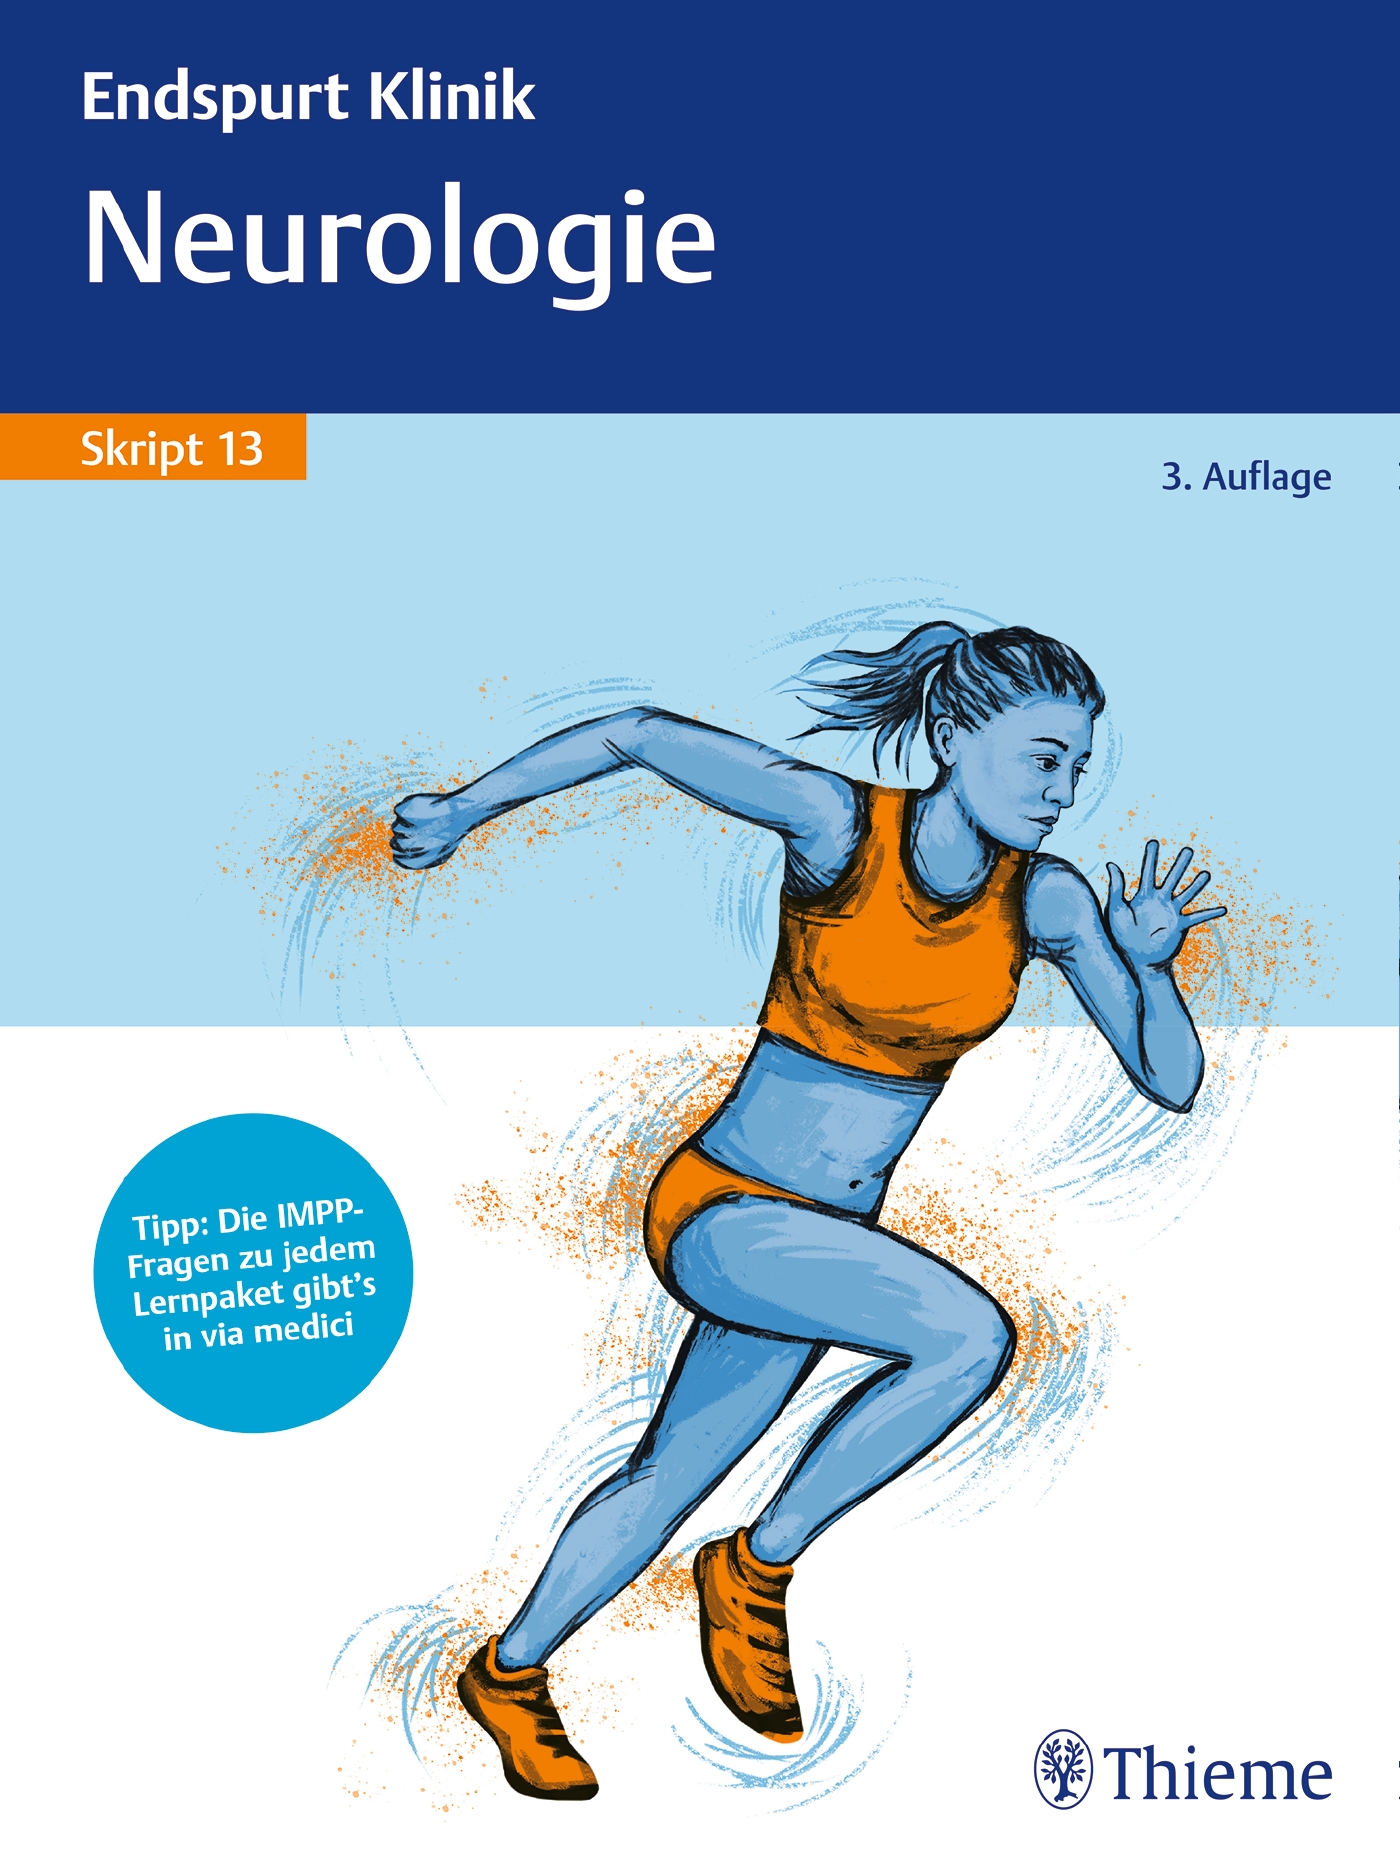 Endspurt Klinik Skript 13: Neurologie